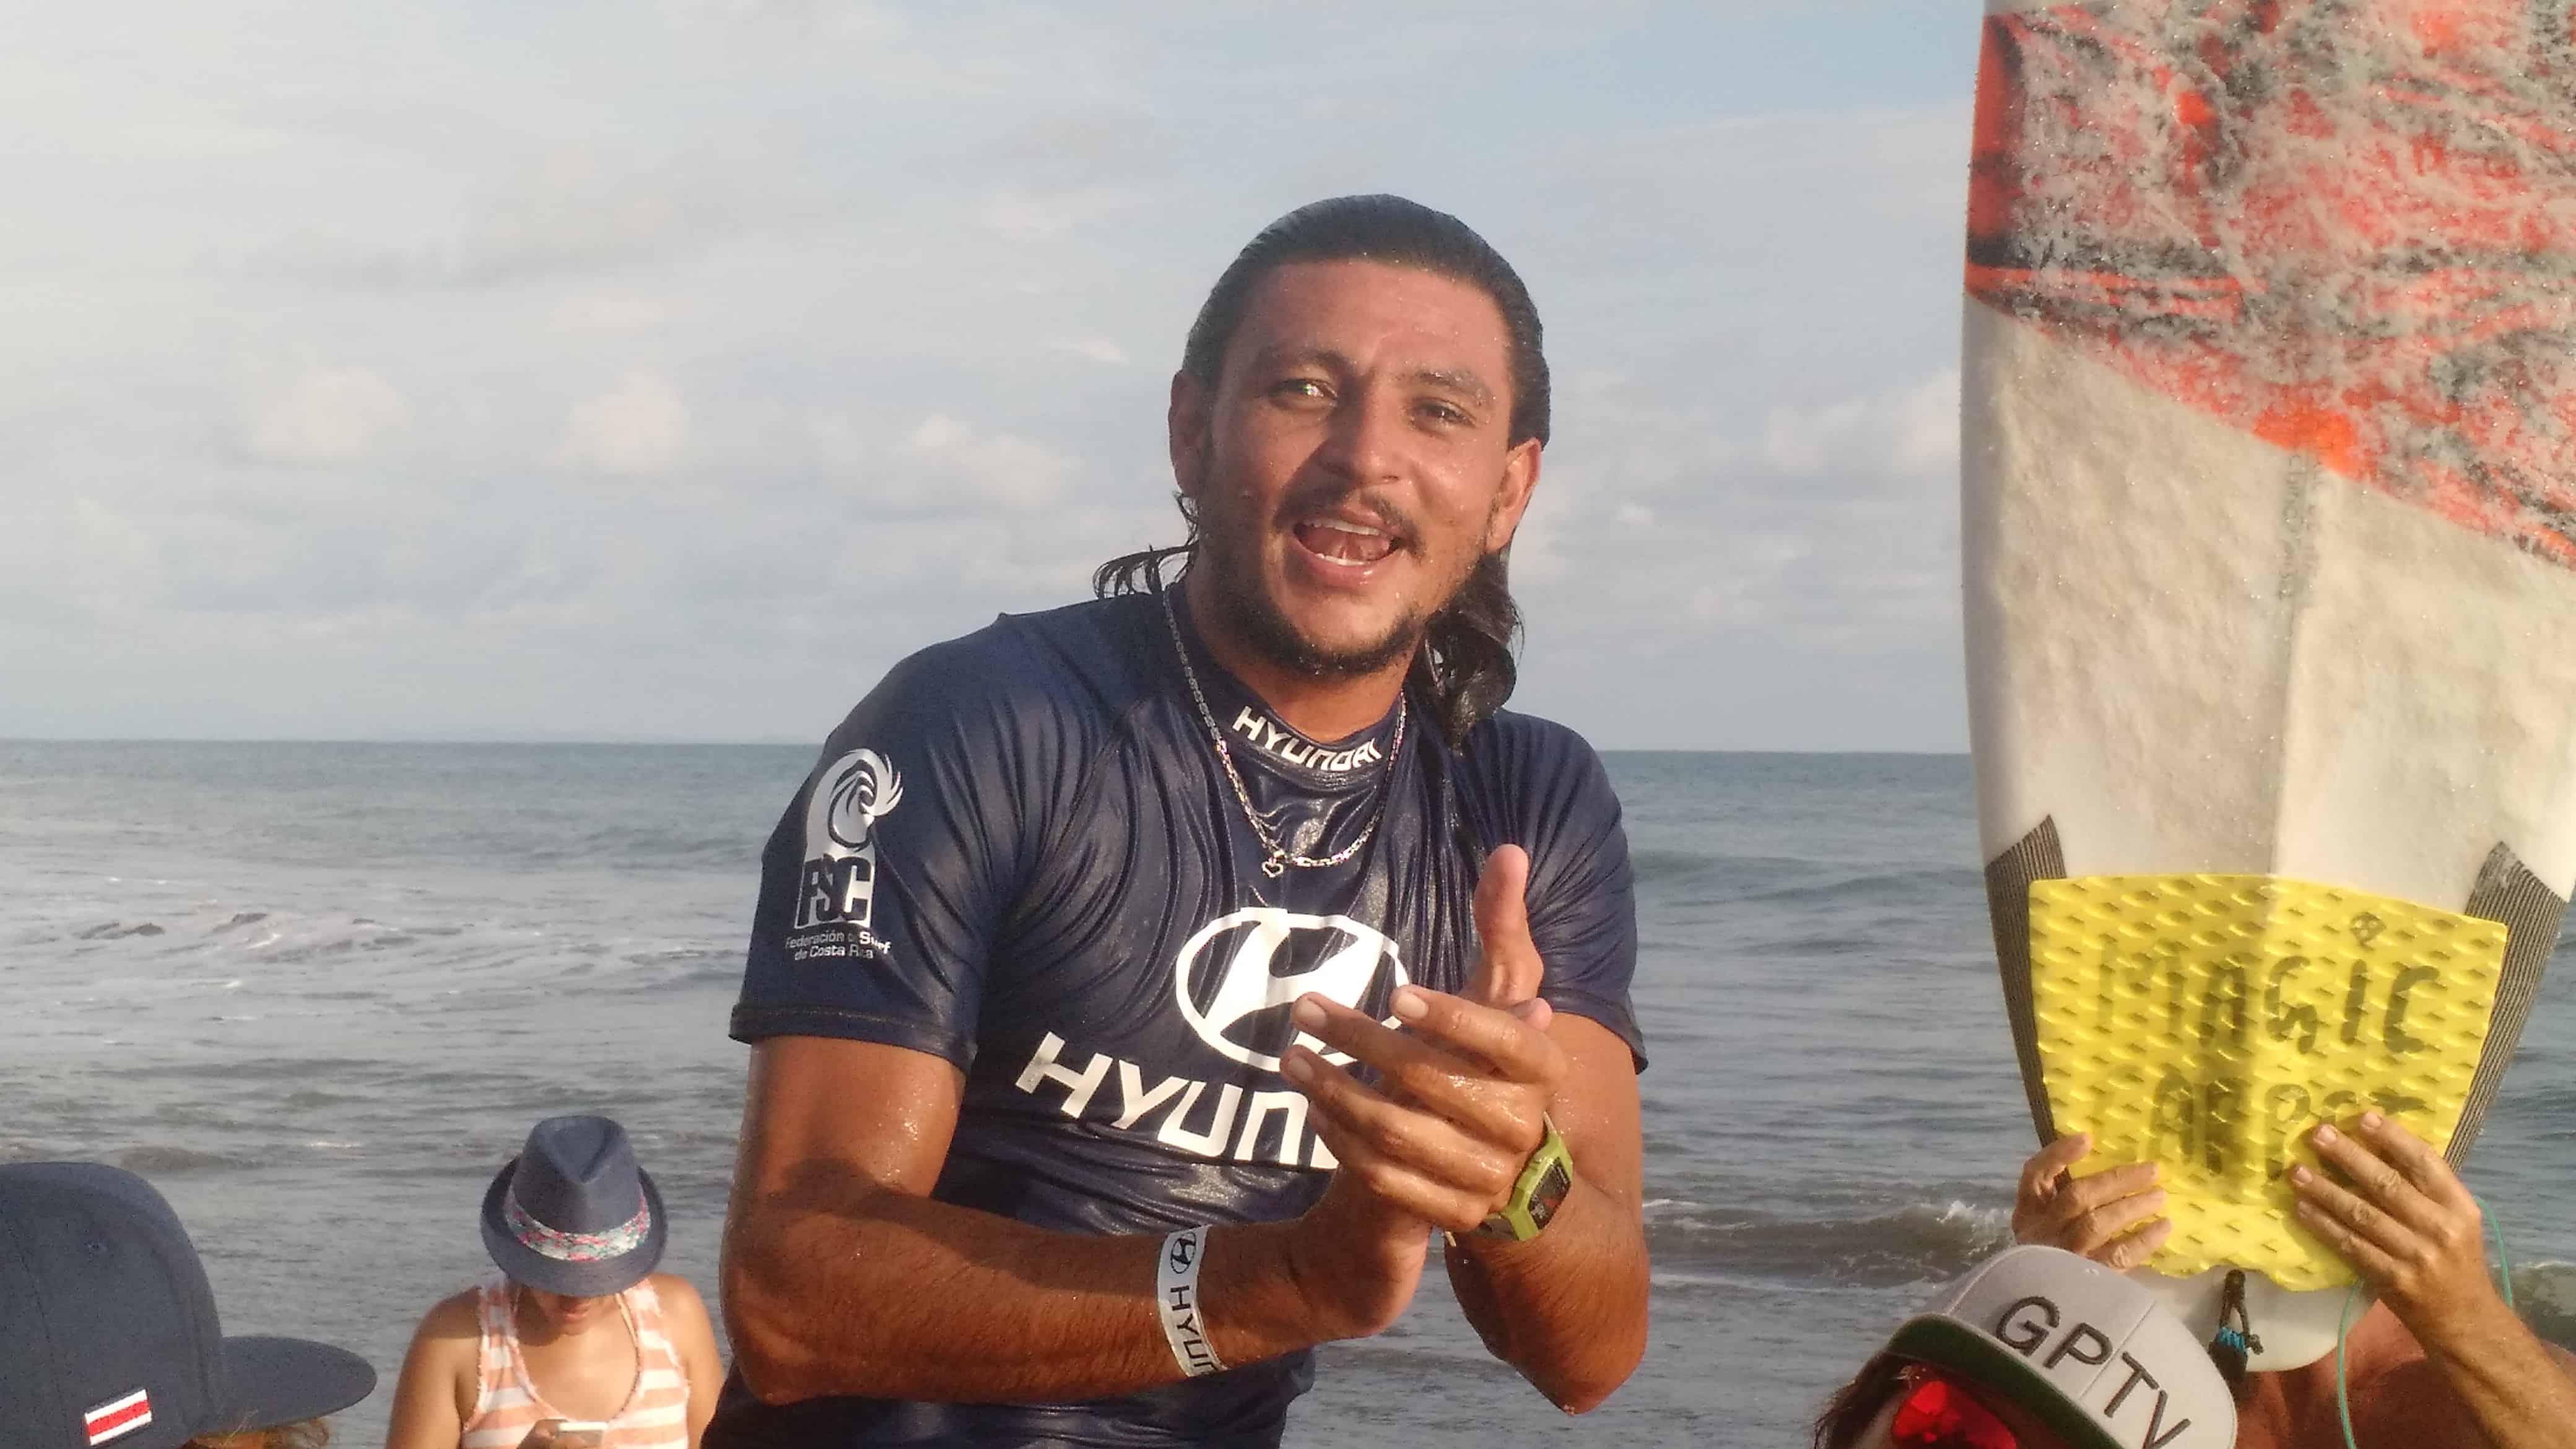 Costa Rica surf i20